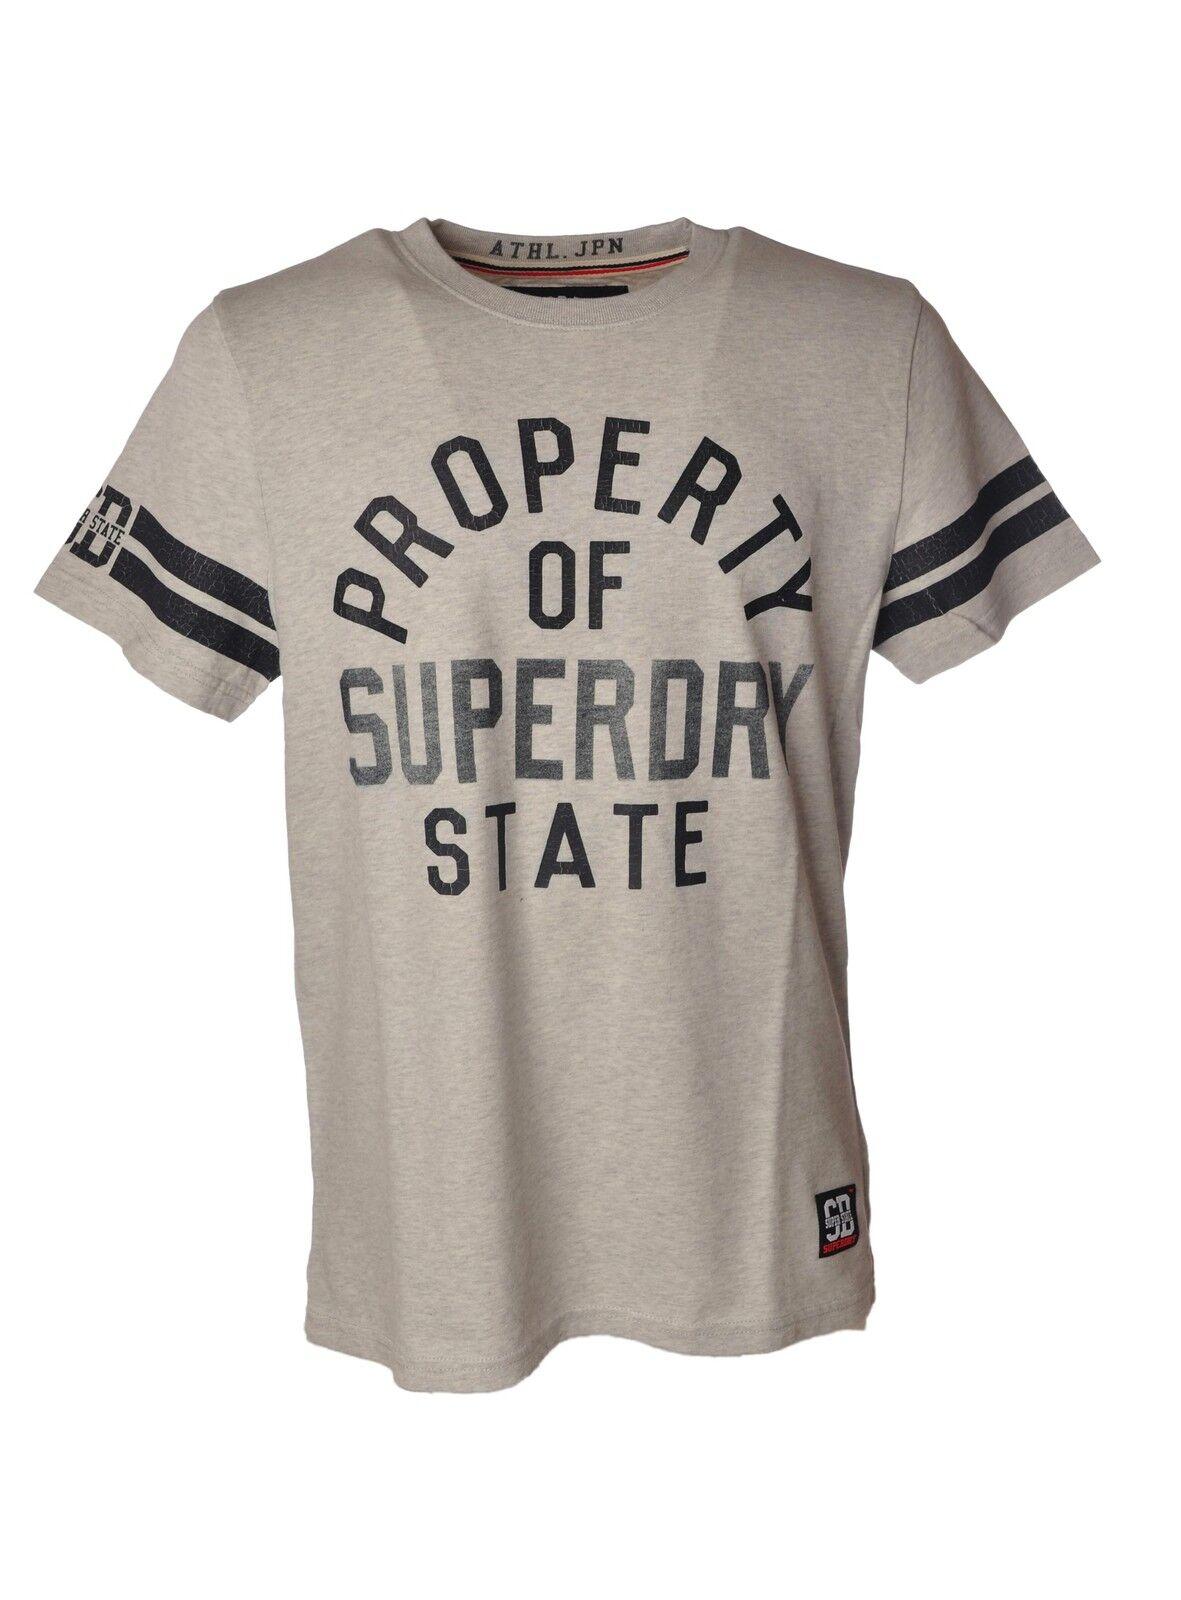 Superdry - Topwear-T-shirts -  Herren - Grigio - 3830403N184250